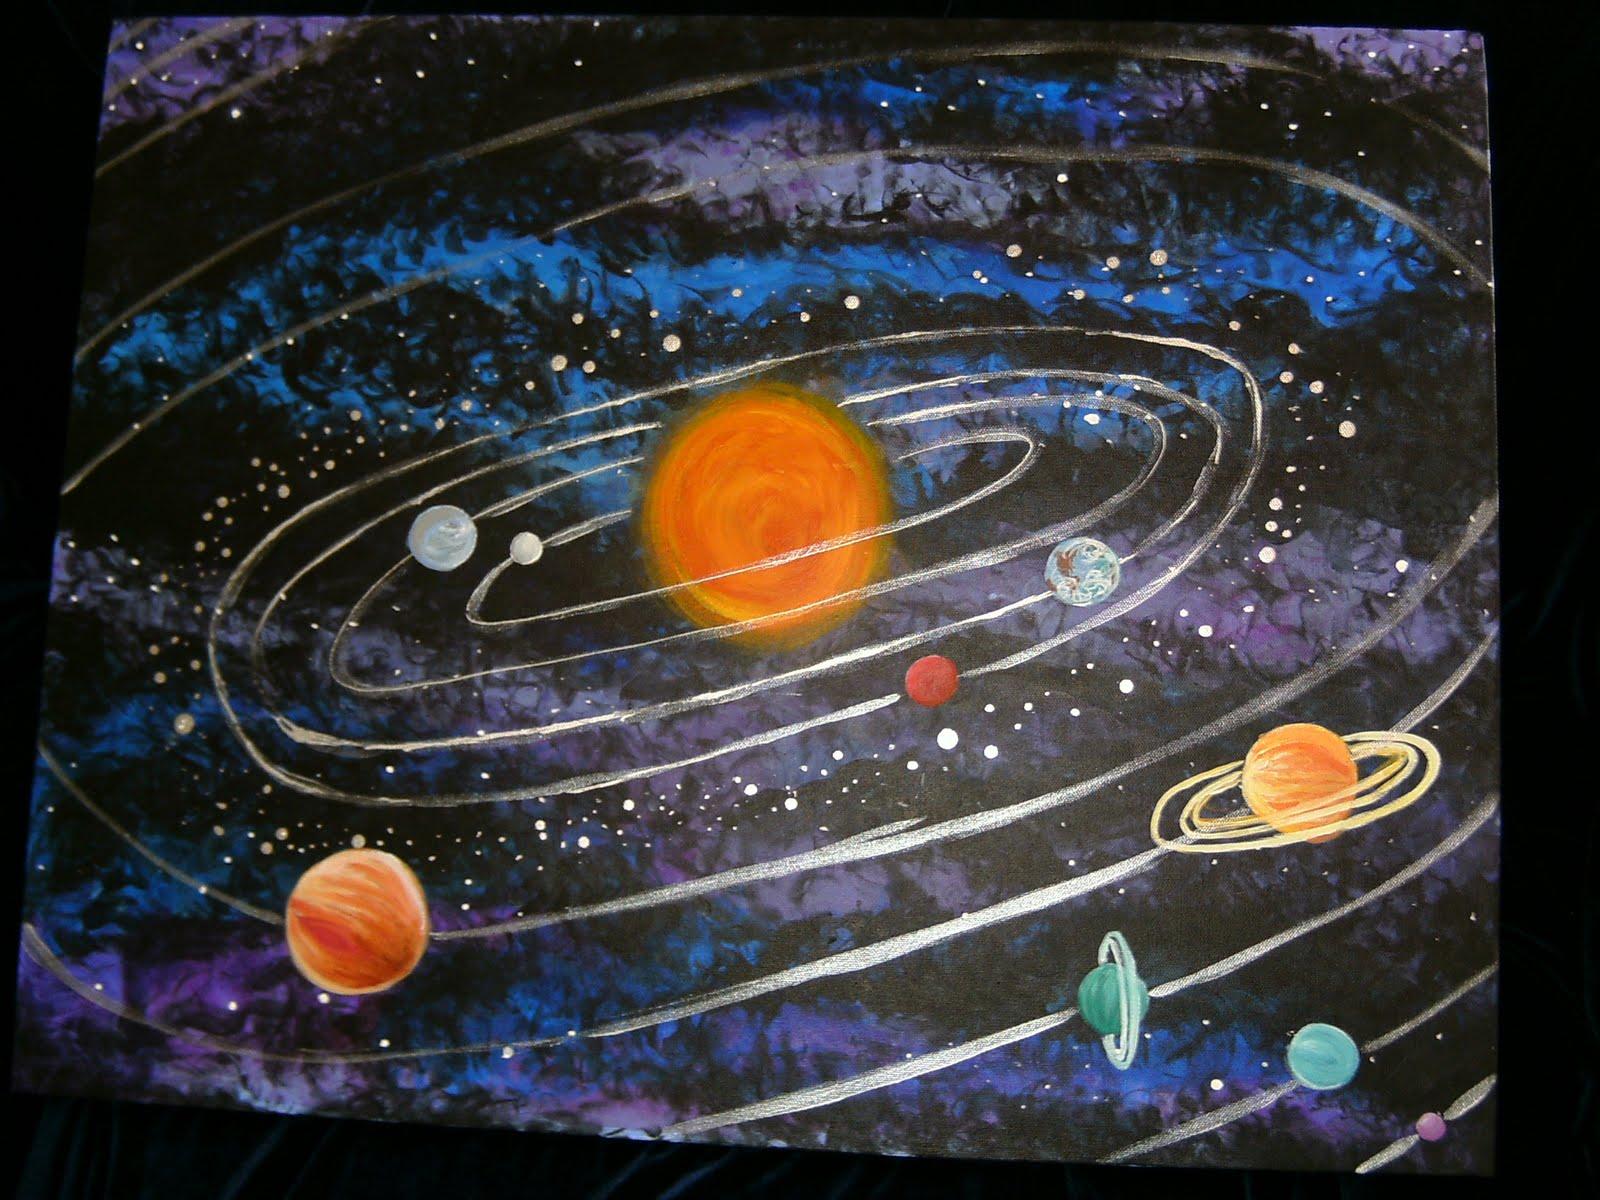 universe solar system paintings art - HD1600×1200